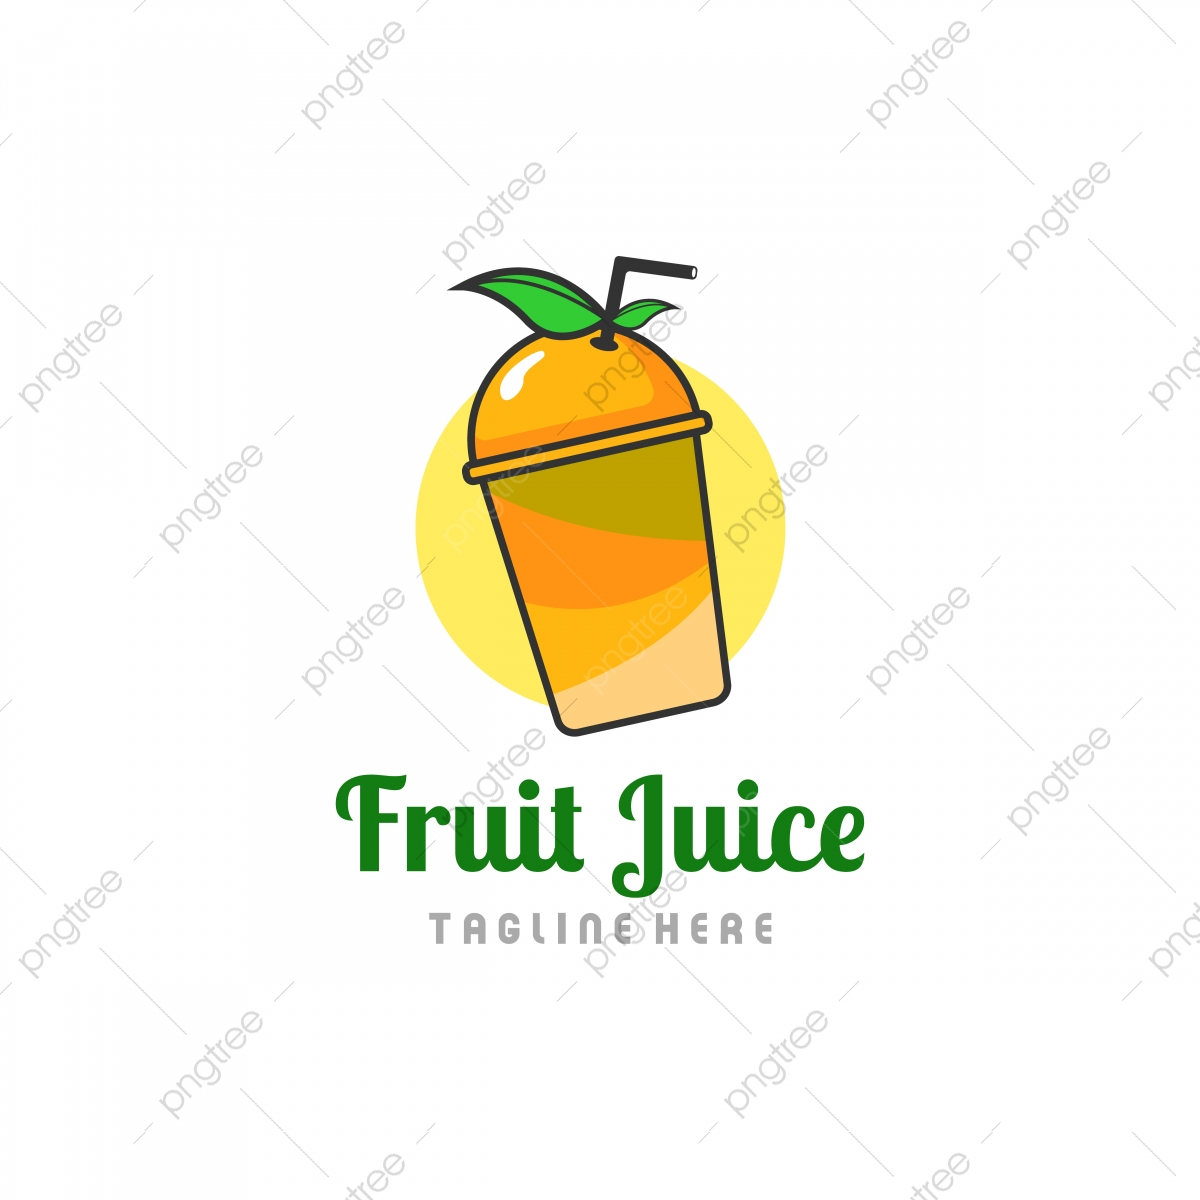 fruit juice png images vector and psd files free download on pngtree https pngtree com freepng fruit juice logo fresh drink logo 4158233 html